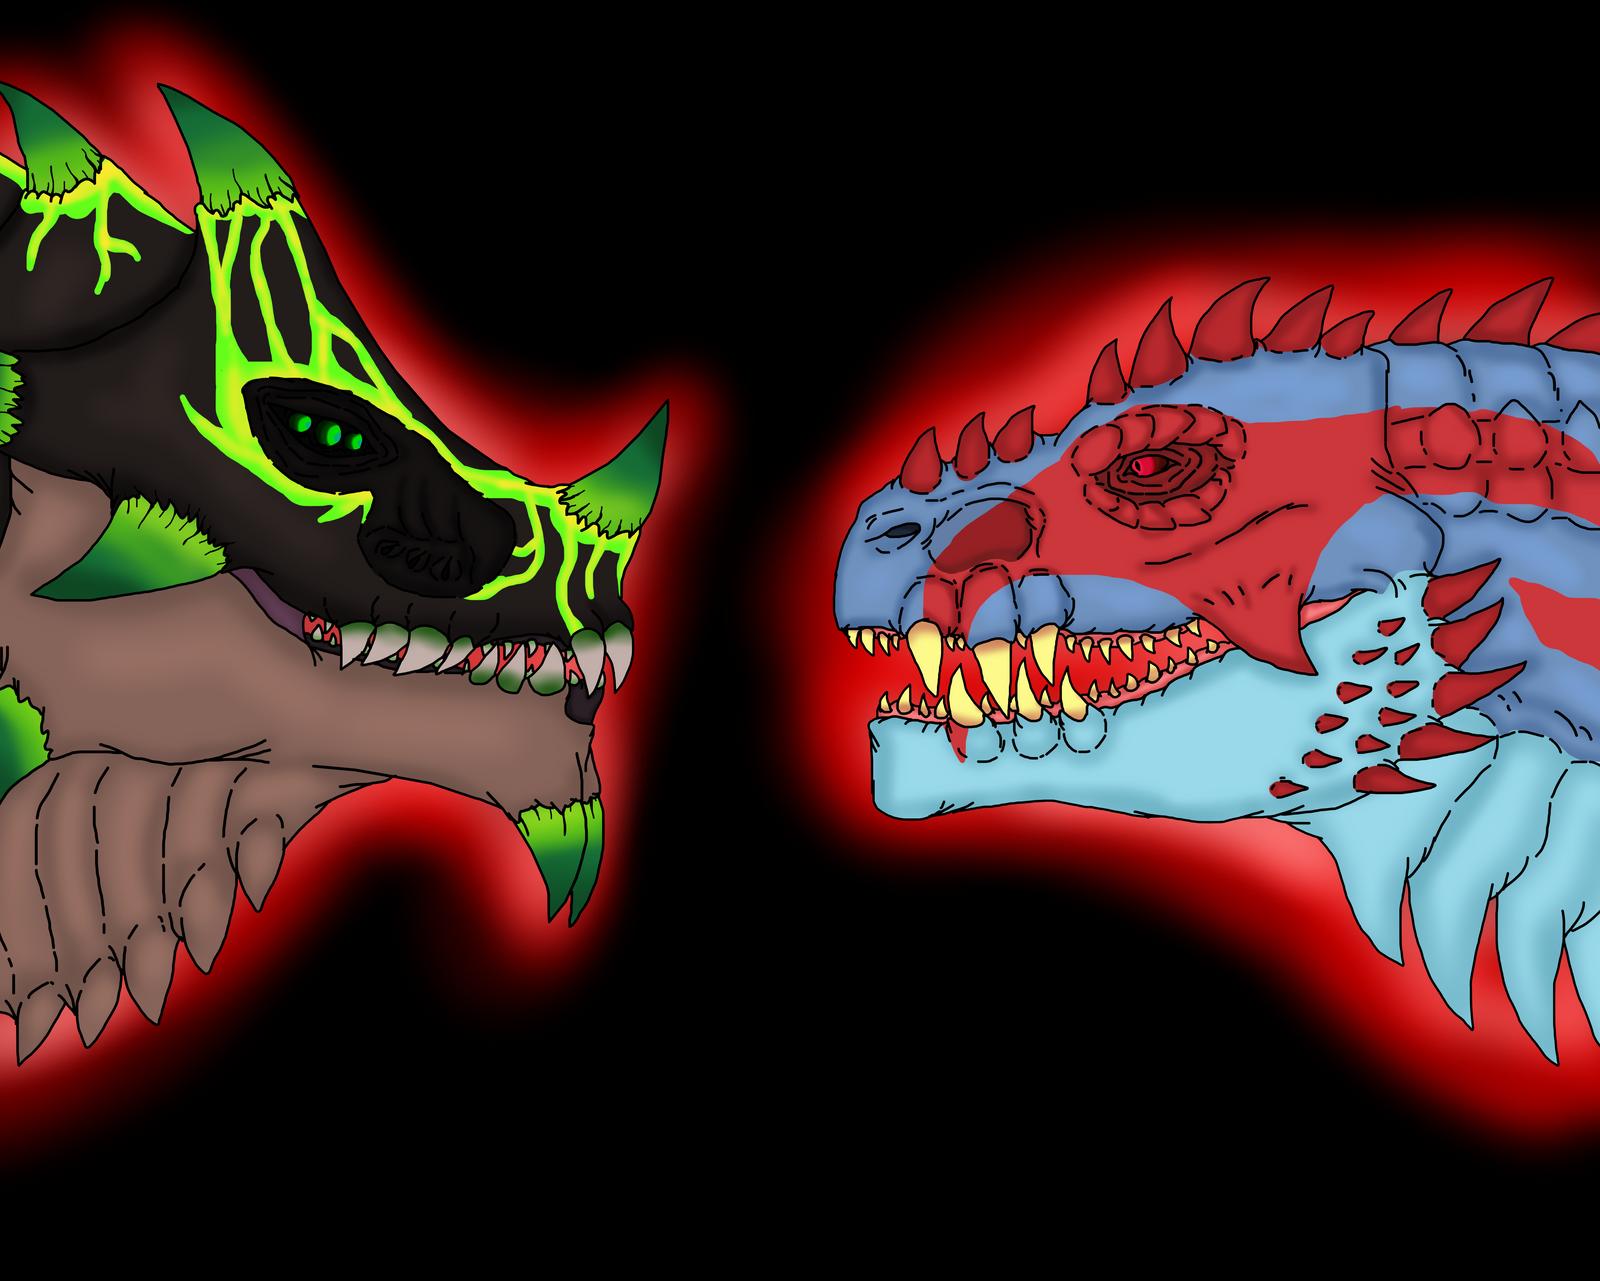 The berserker kaiju and the resurrection kaiju by Redspets